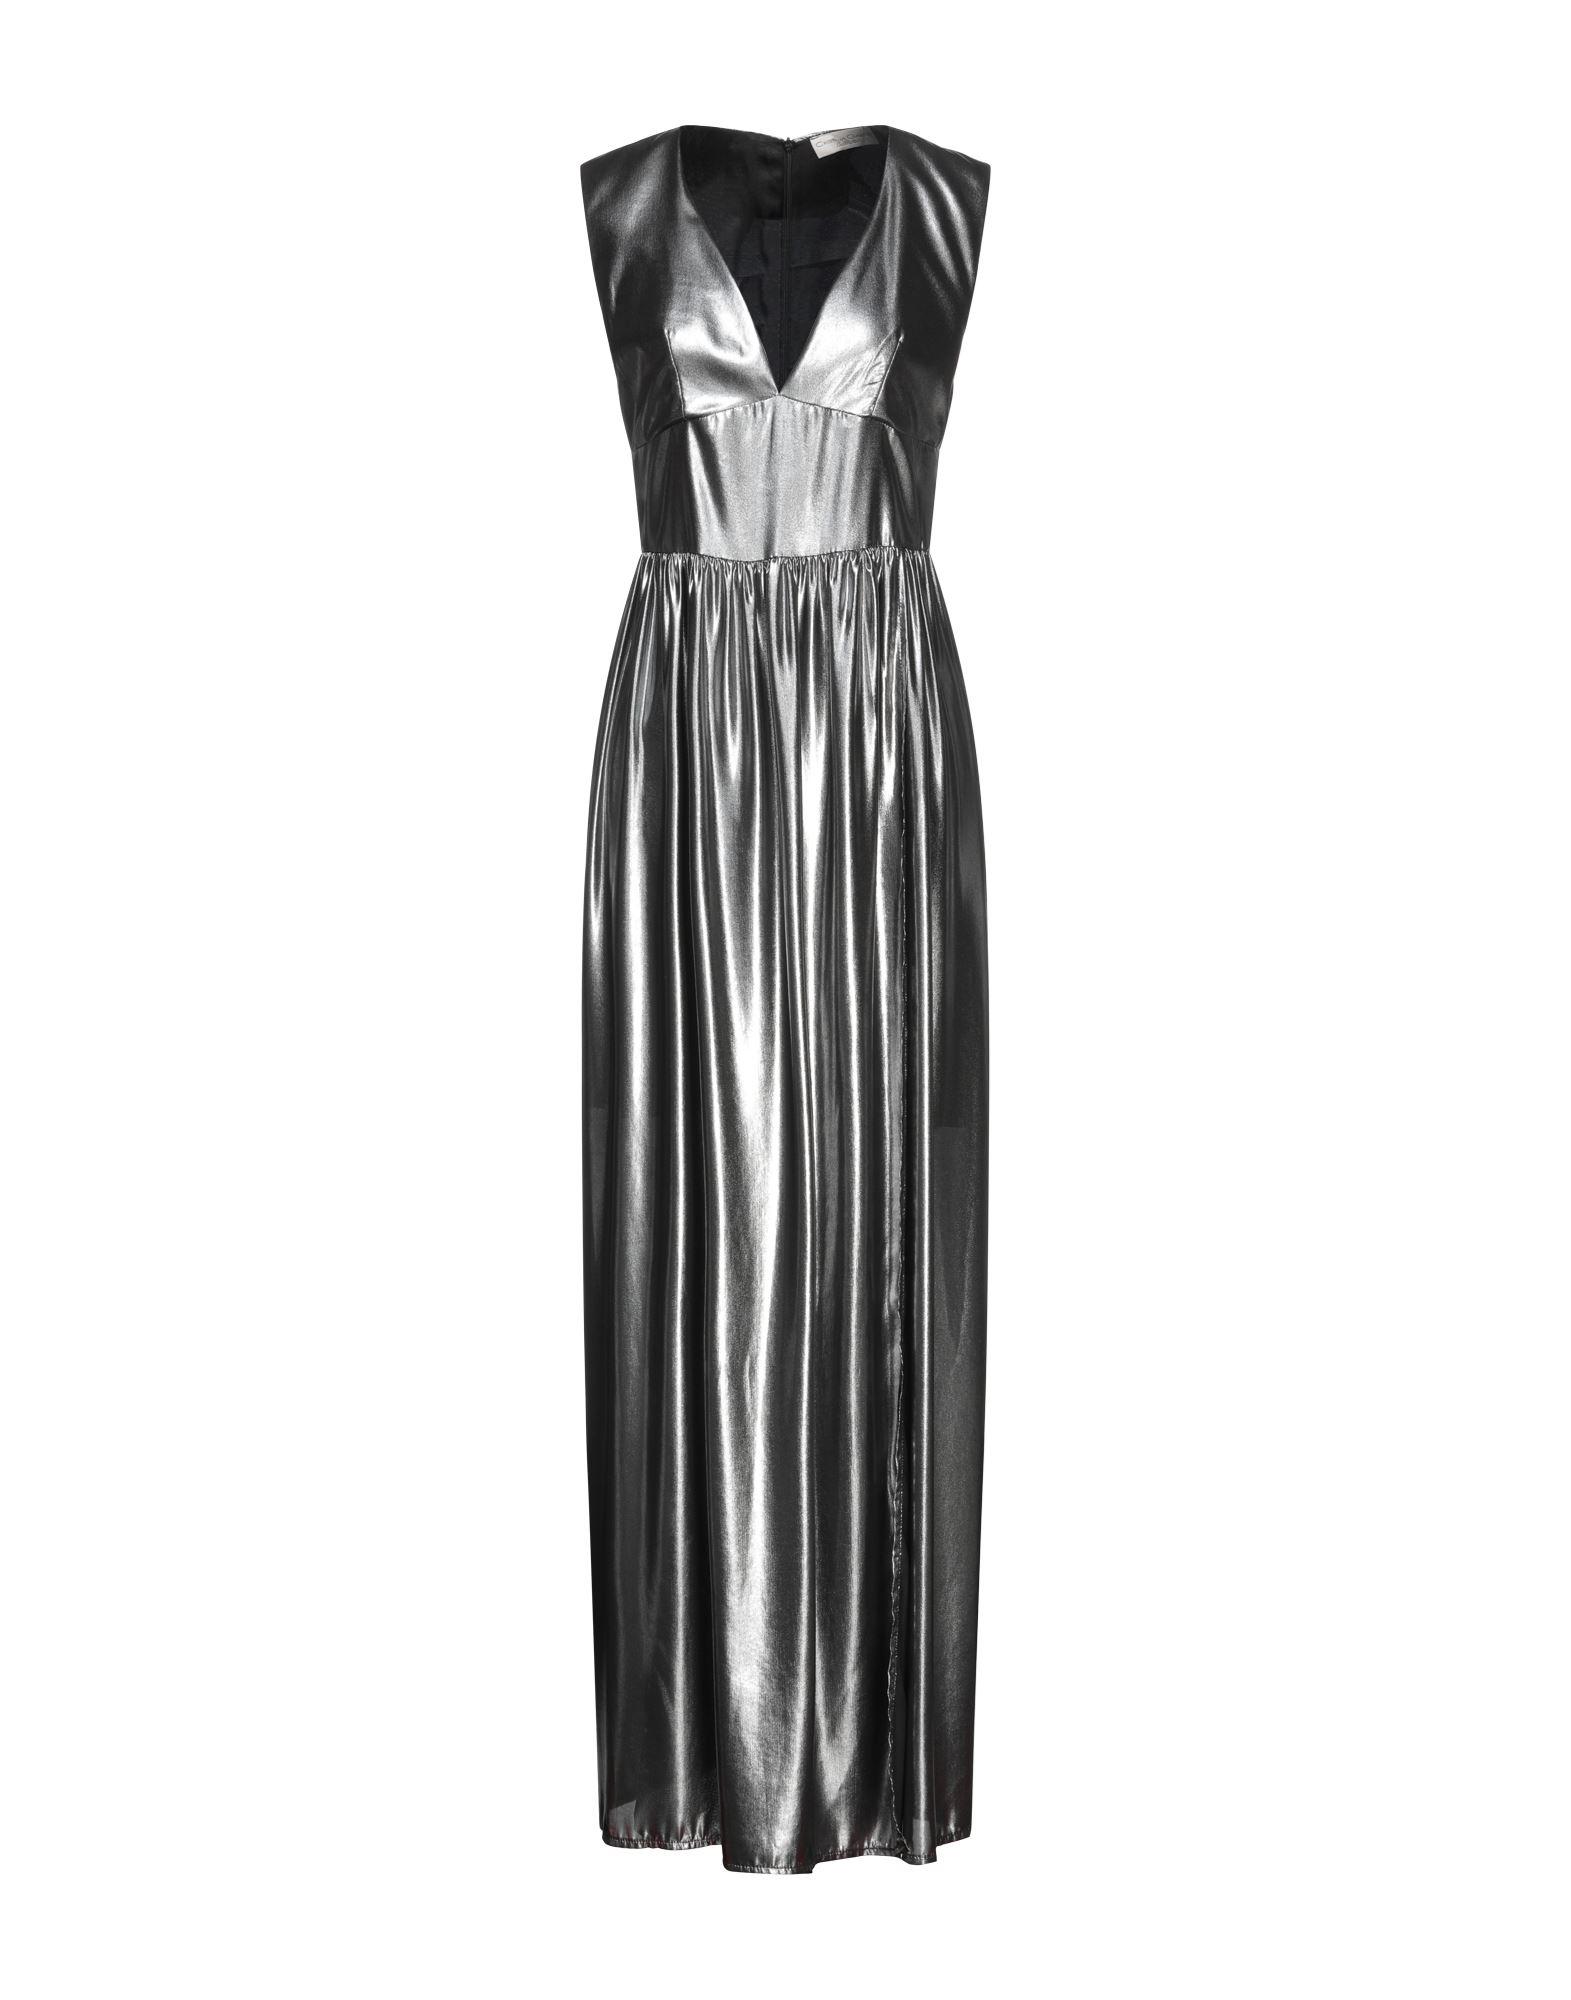 cristina gavioli collection длинное платье CRISTINA GAVIOLI Длинное платье